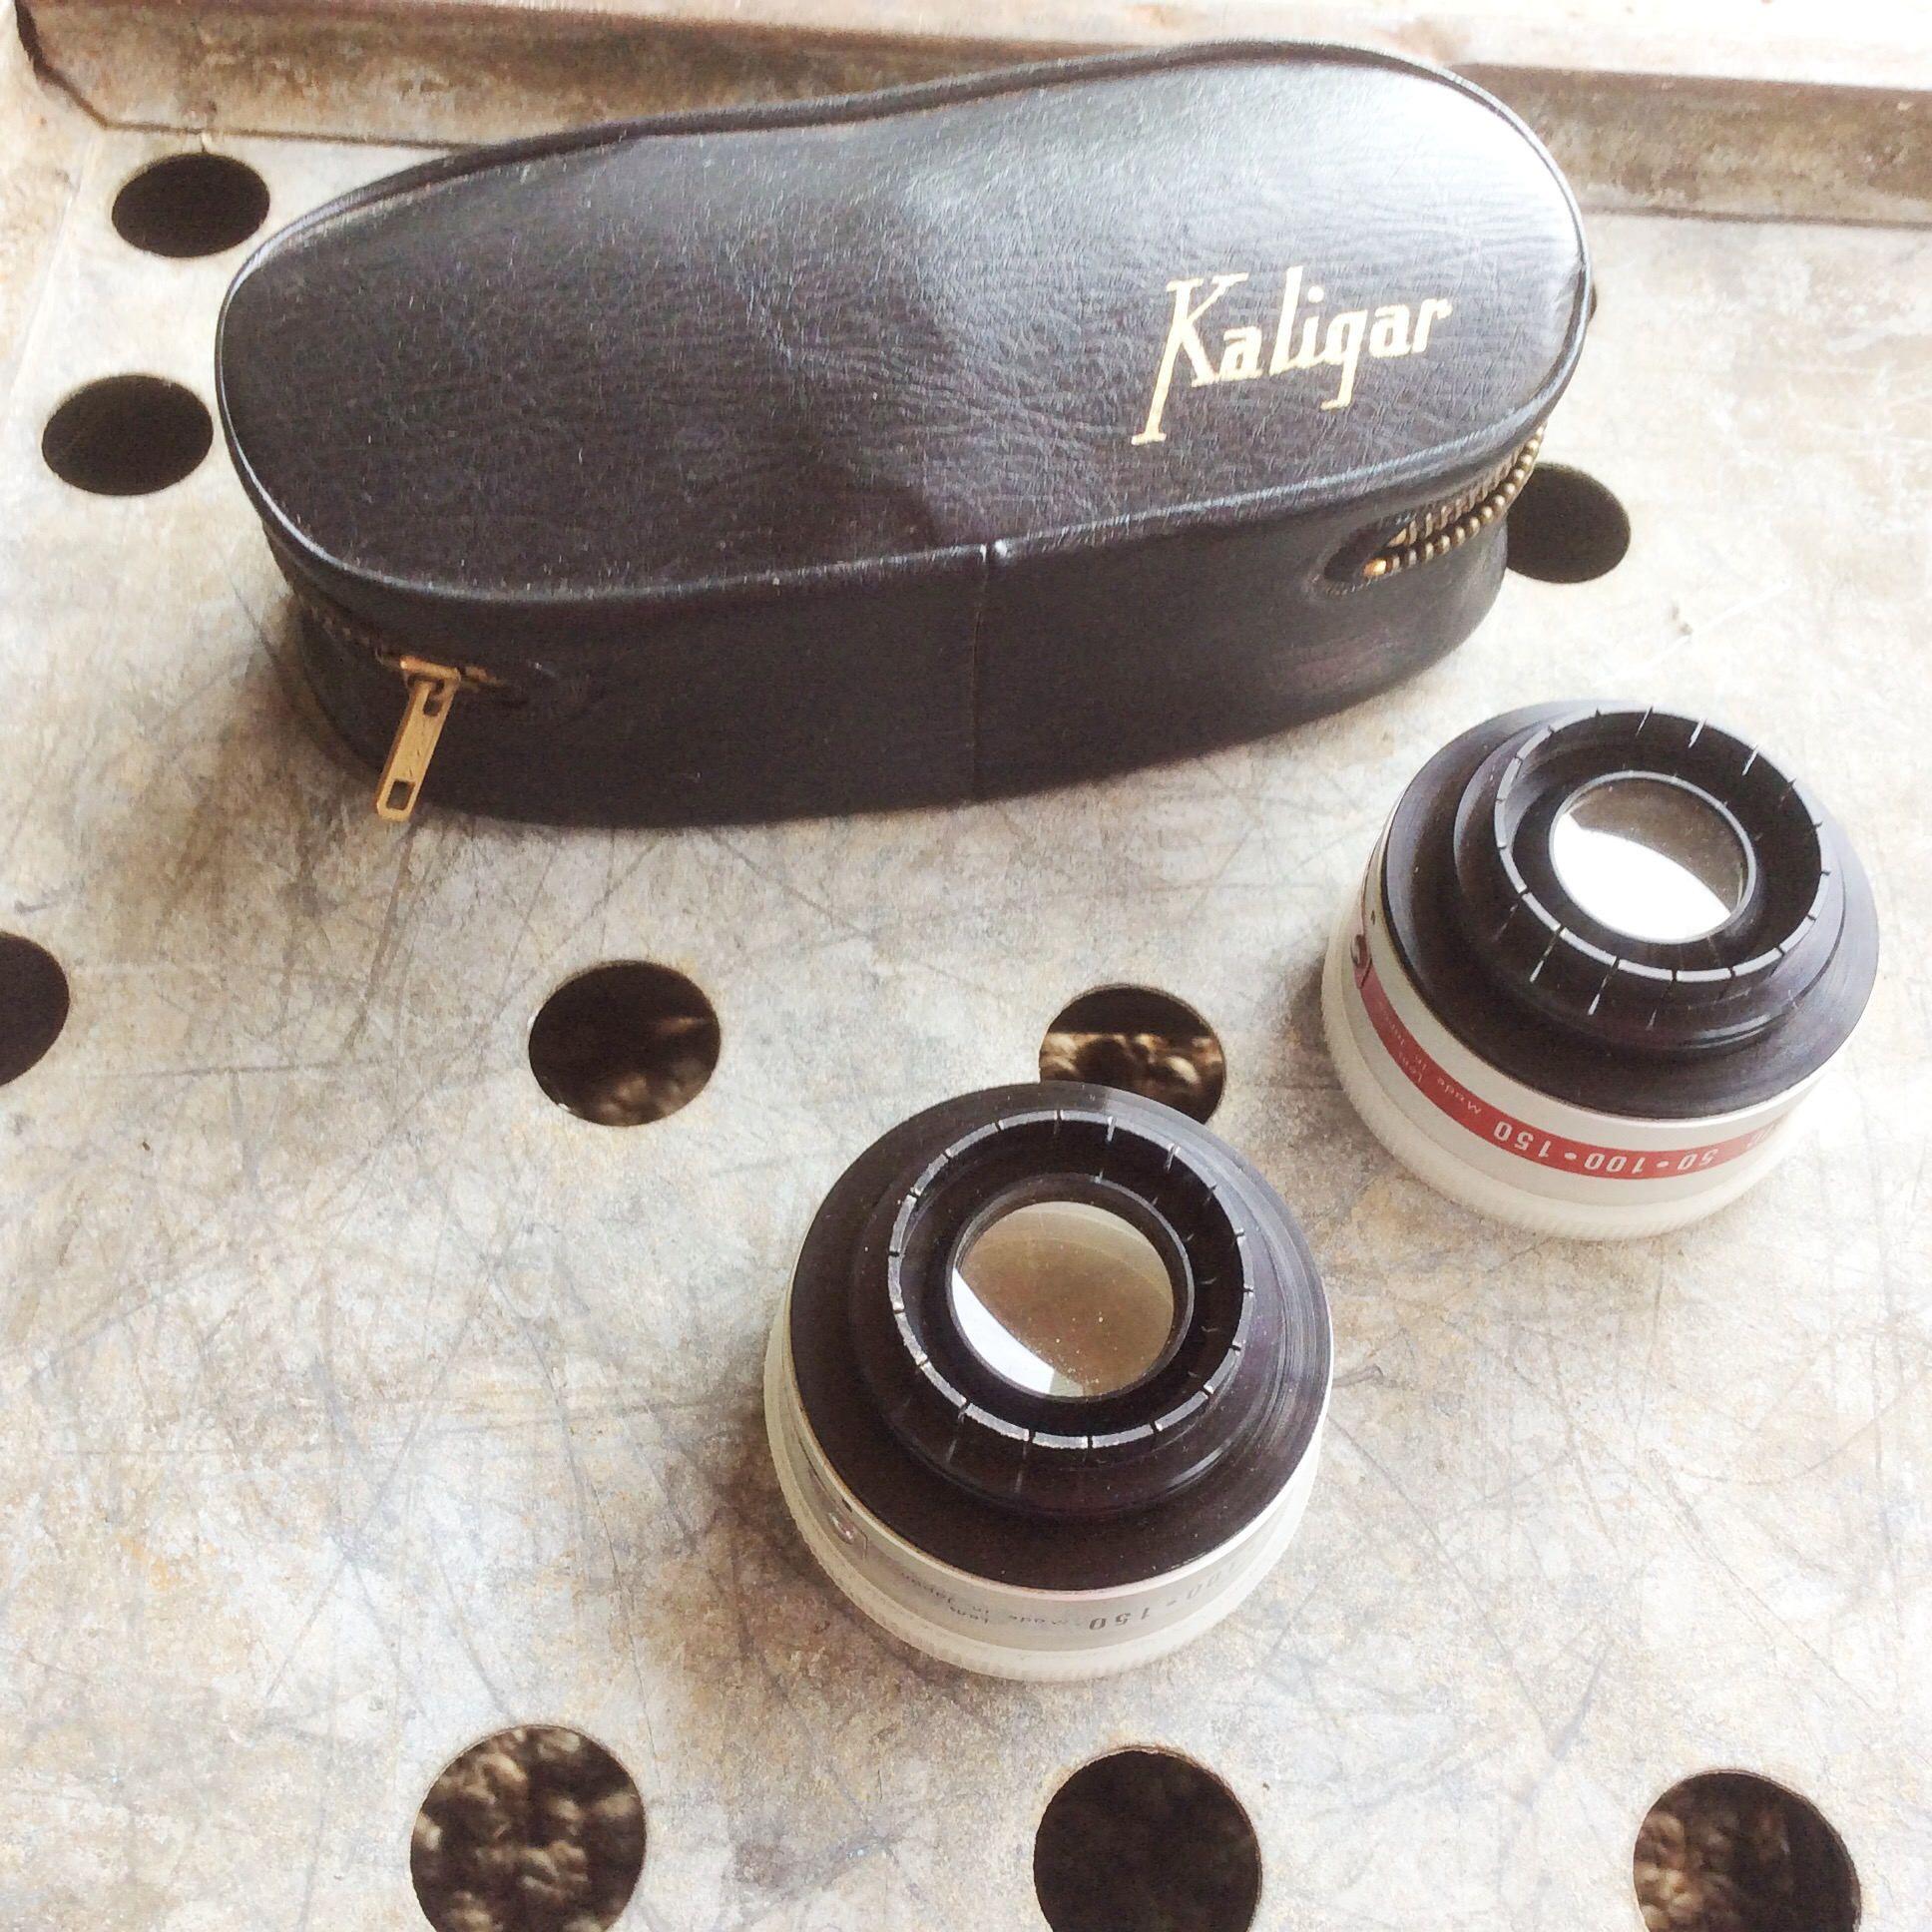 Vintage Kaligar Aux Telephoto Wide Angle Camera Lens Set Etsy Vintage Camera Lens Leather Case Camera Lens Accessories